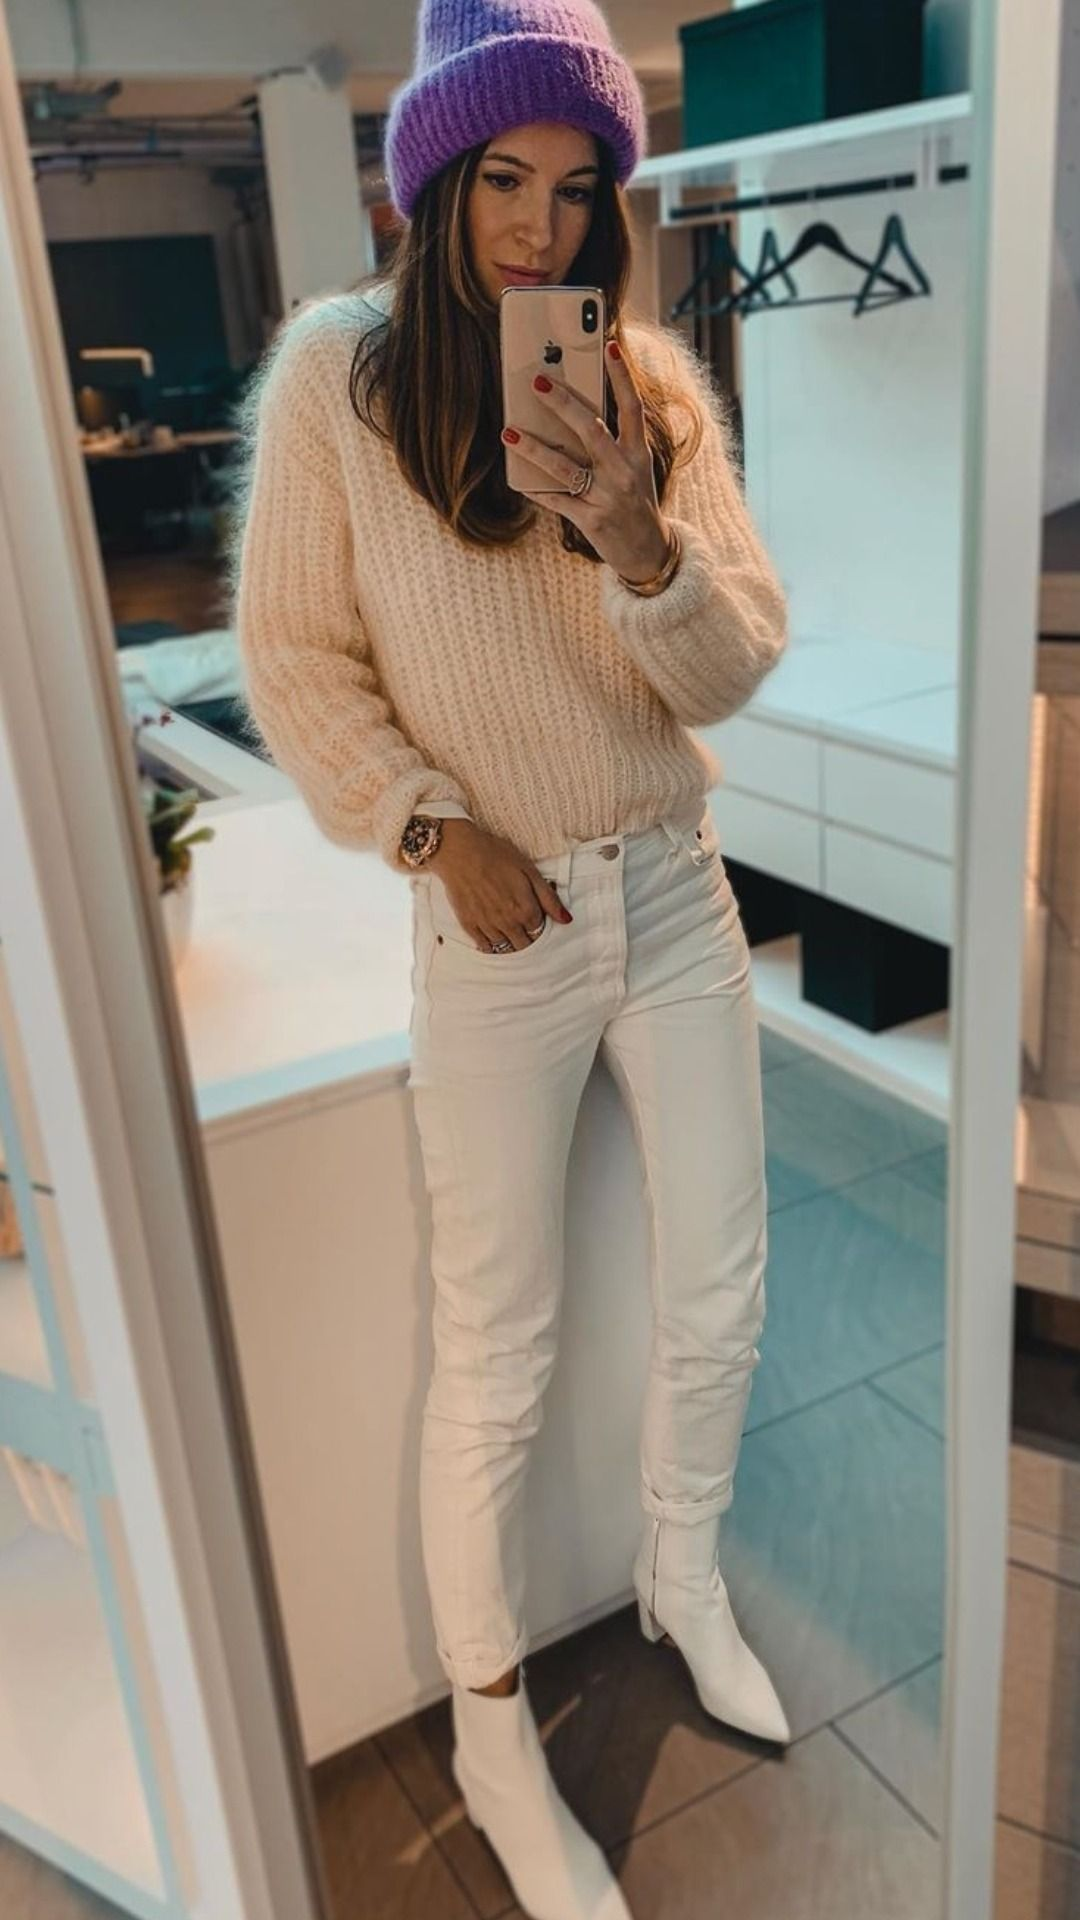 Tumblr | Knit fashion, Knitwear fashion, Fluffy sweater